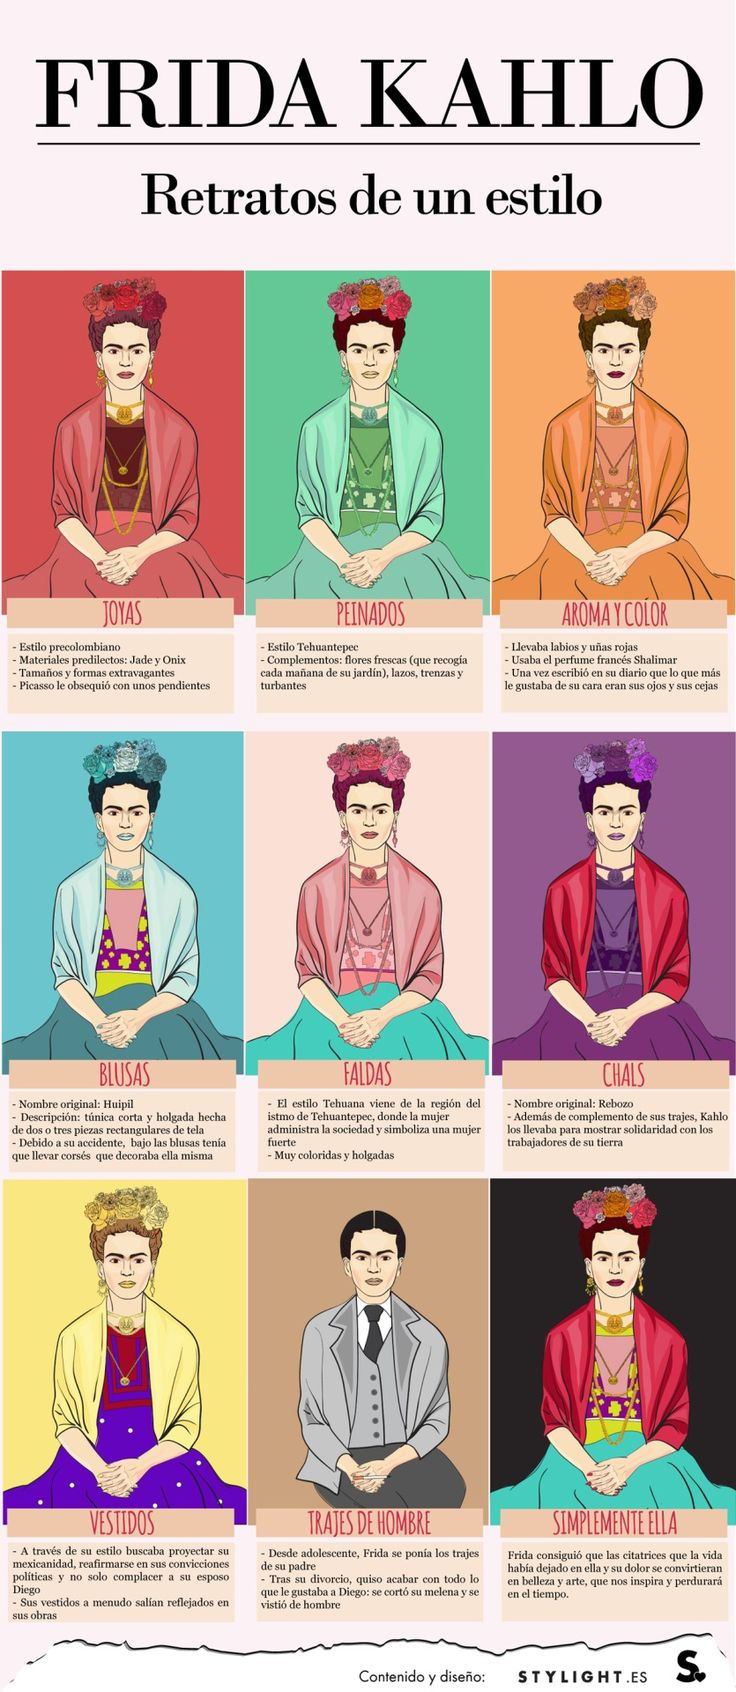 Frida's style http://fridaencoyoacan.tumblr.com/post/103499871924